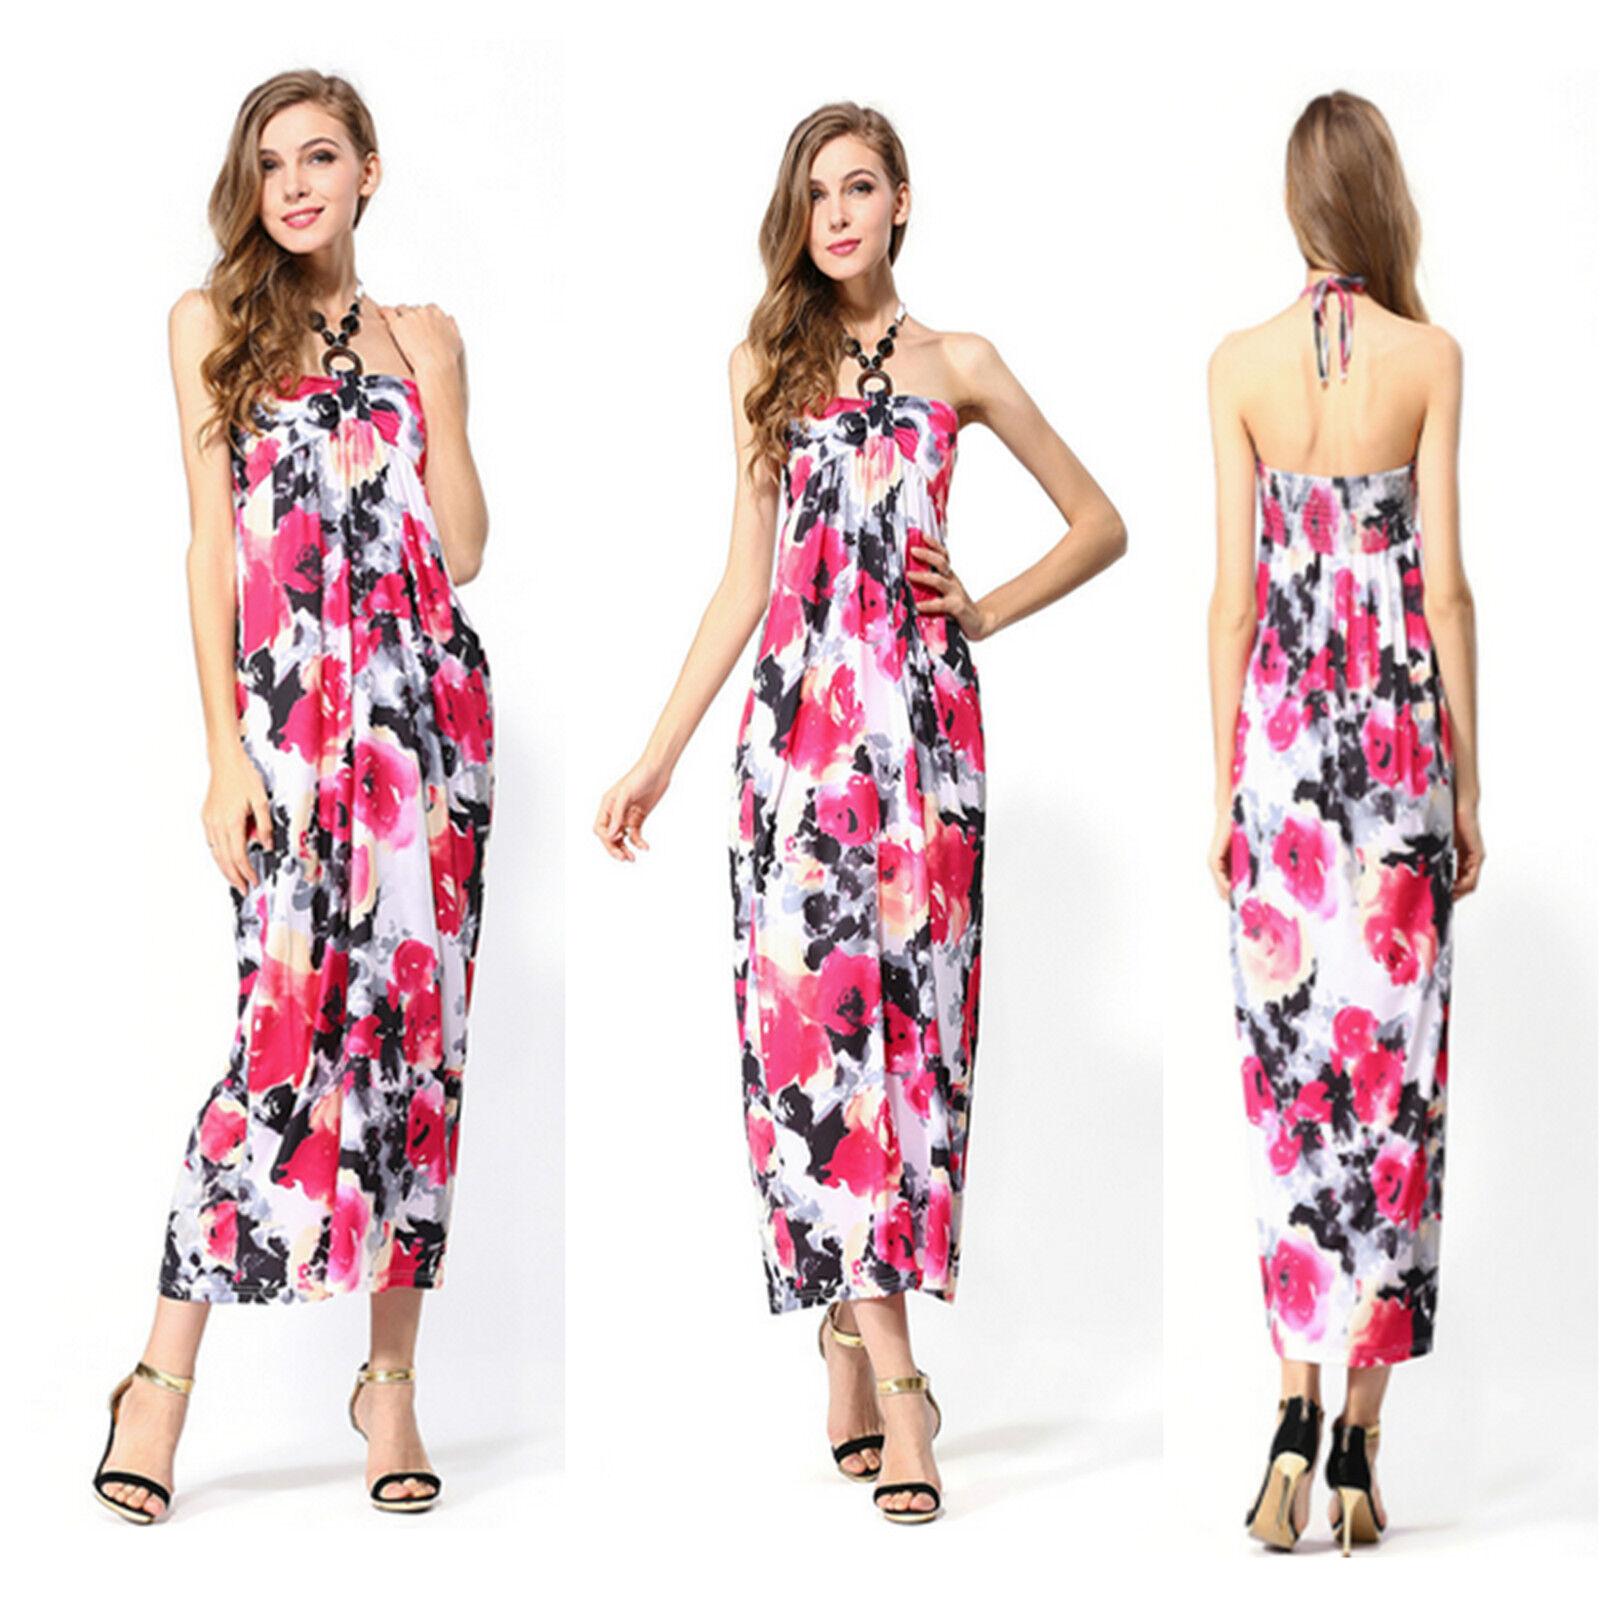 Womens Summer Beach Short Floral Holiday Mini Dress Ladies Evening UK Vincenza